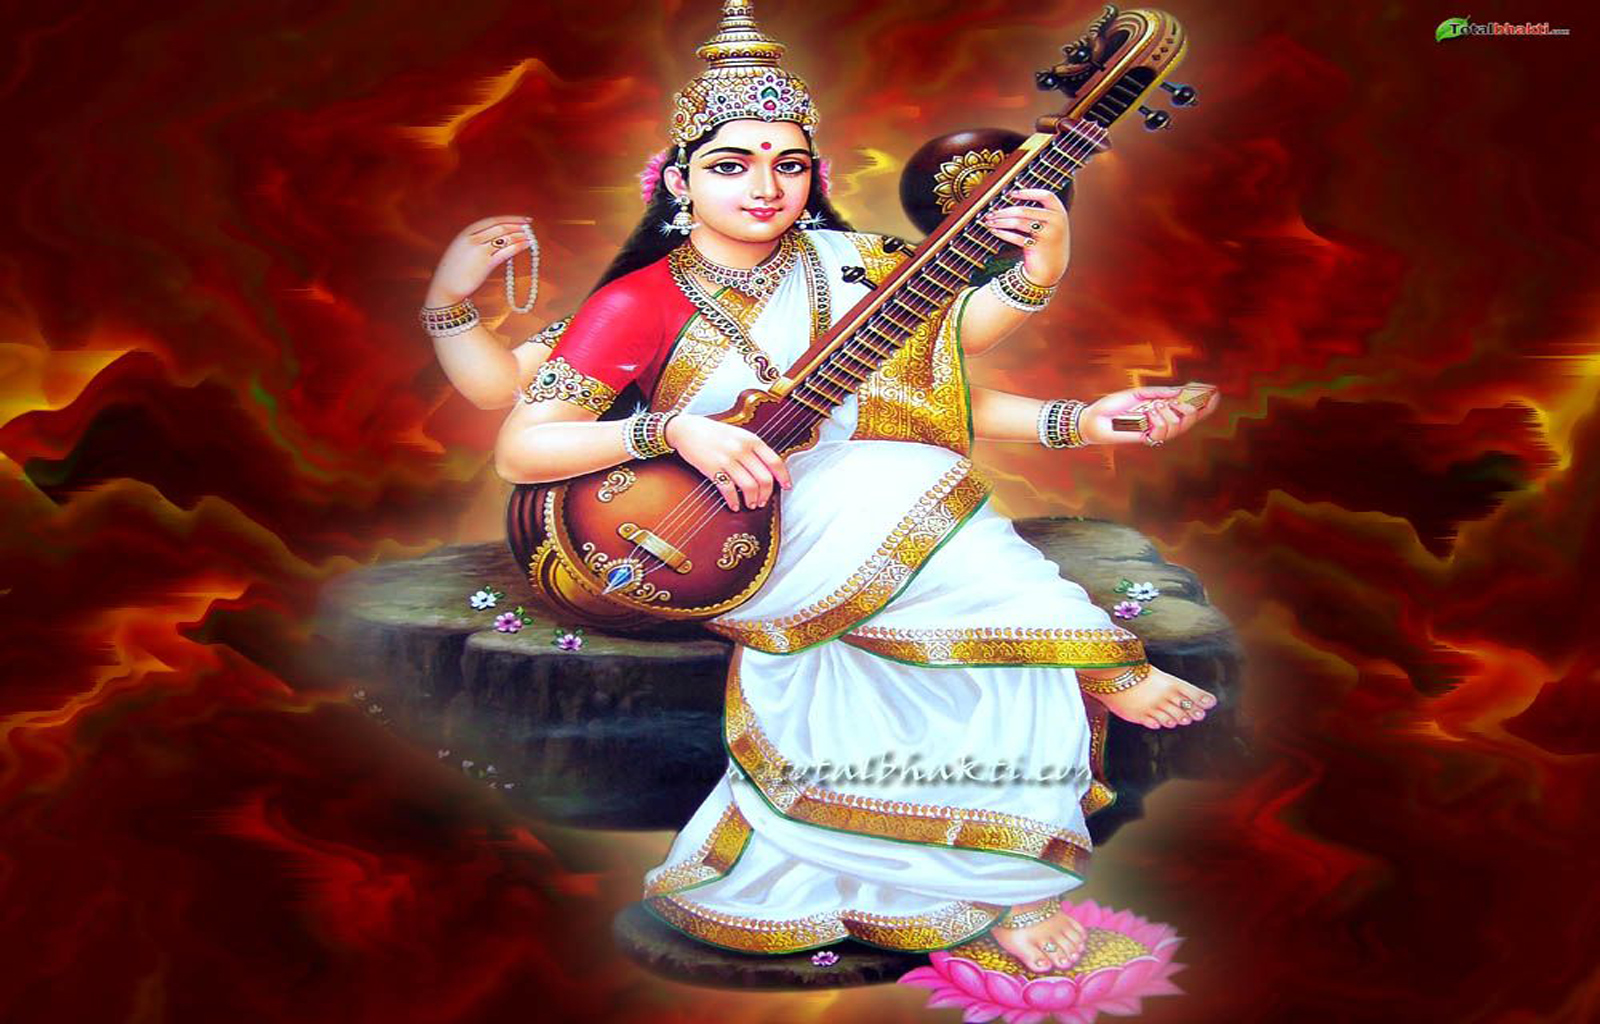 picture collection: Hindu goddess Saraswati maa wallpapers